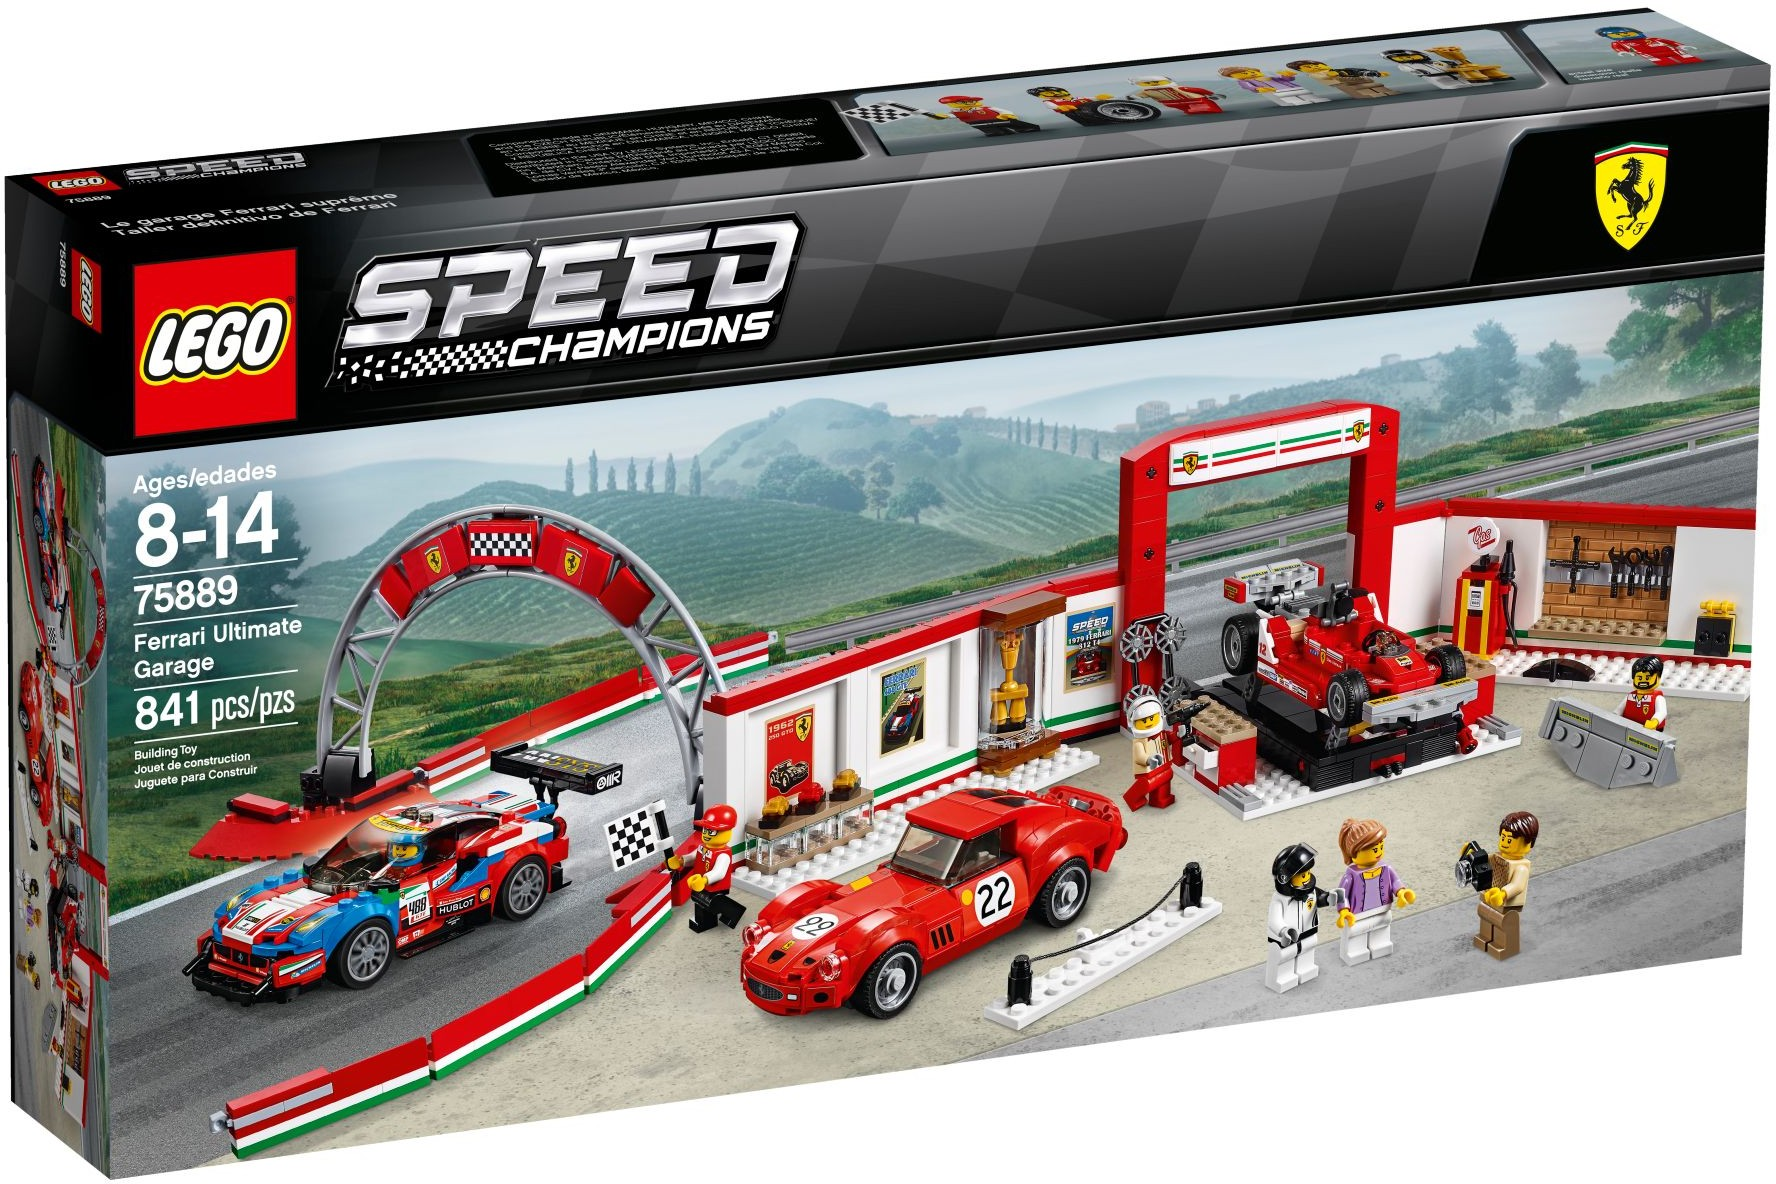 ☆勳寶玩具舖【現貨】LEGO 樂高 SPEED 賽車系列 75889 Ferrari Ultimate Garage